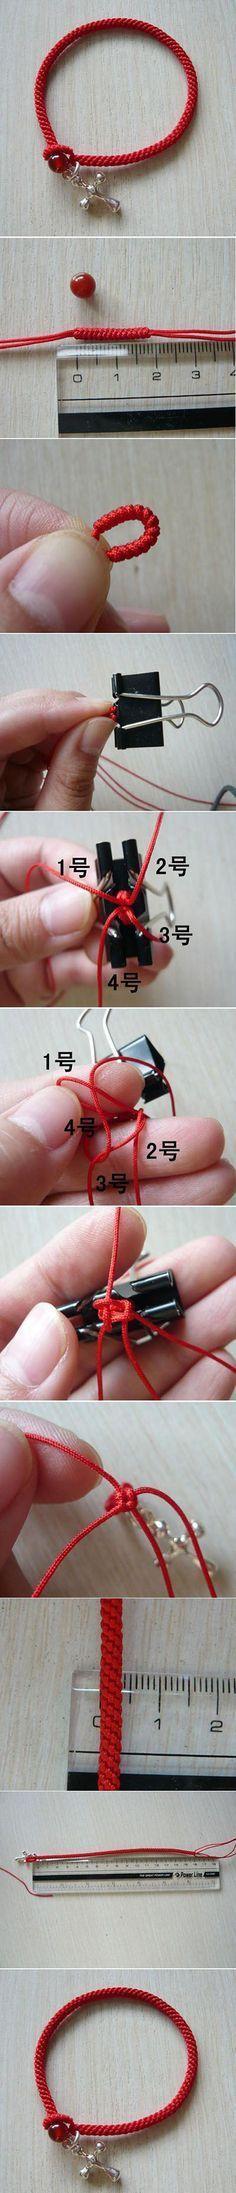 Easy Bracelet | DIY & Crafts Tutorials